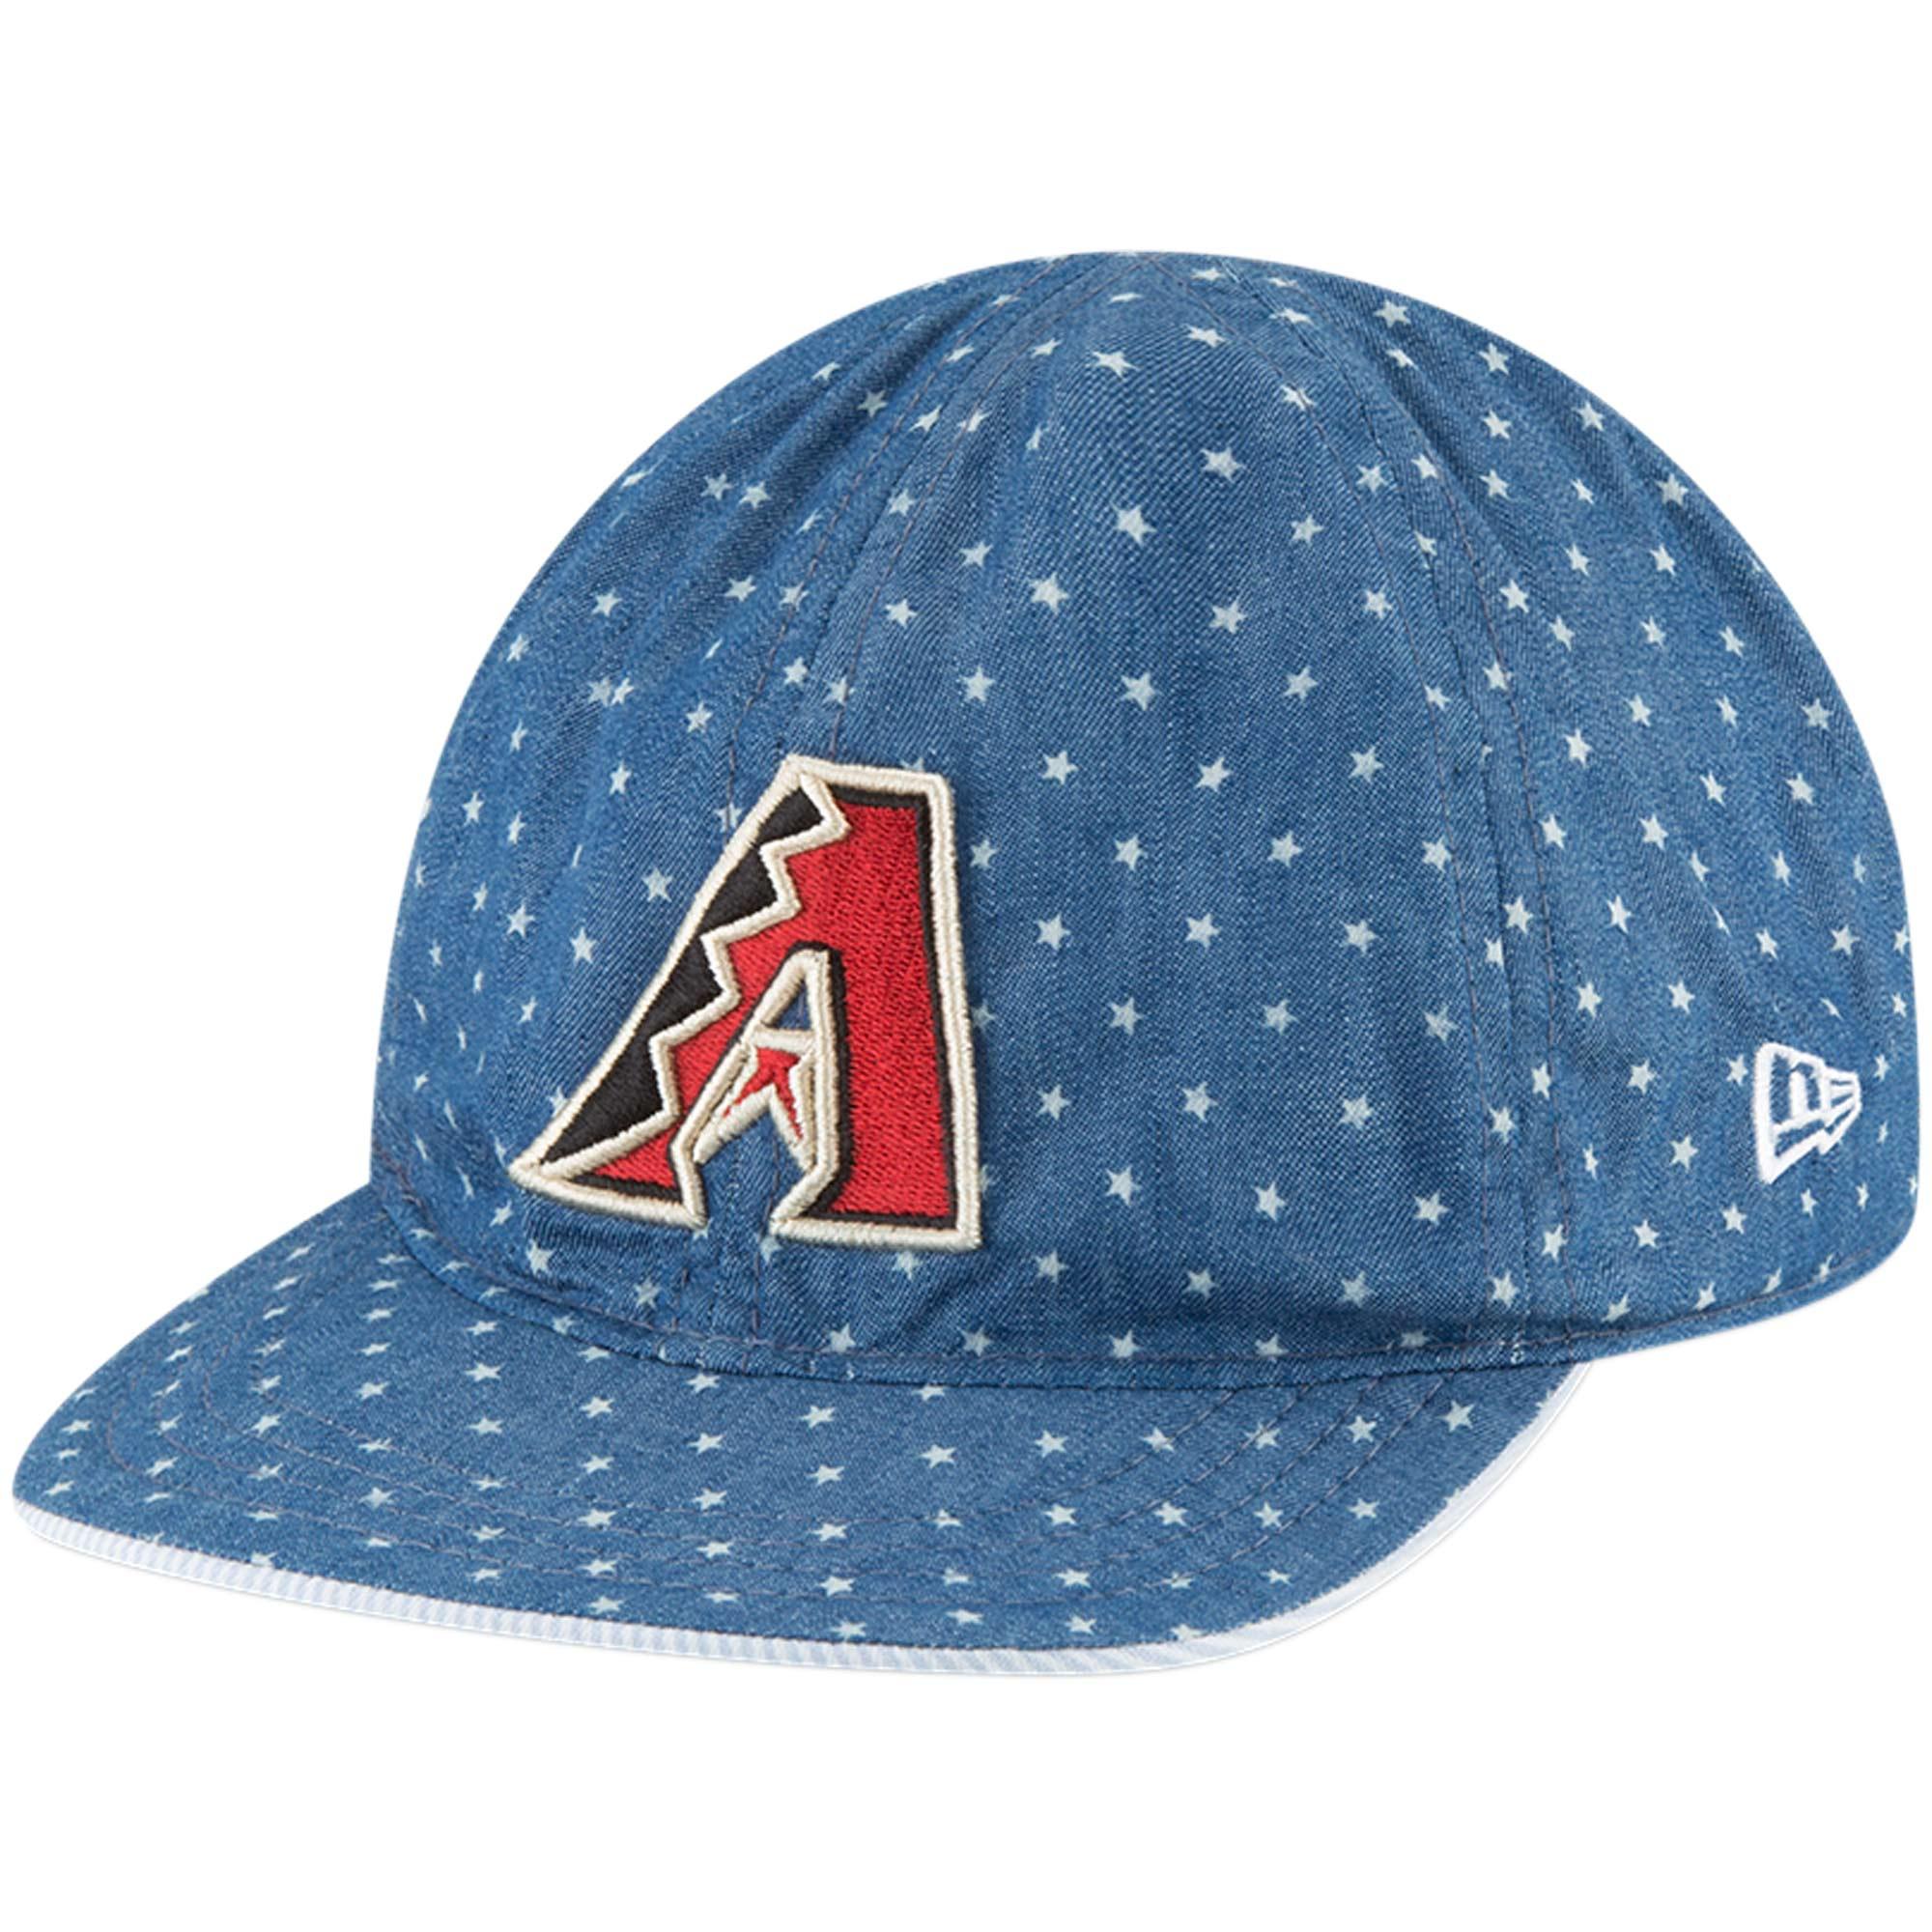 Arizona Diamondbacks New Era Infant Flip 9TWENTY Adjustable Hat - Denim/White - OSFA